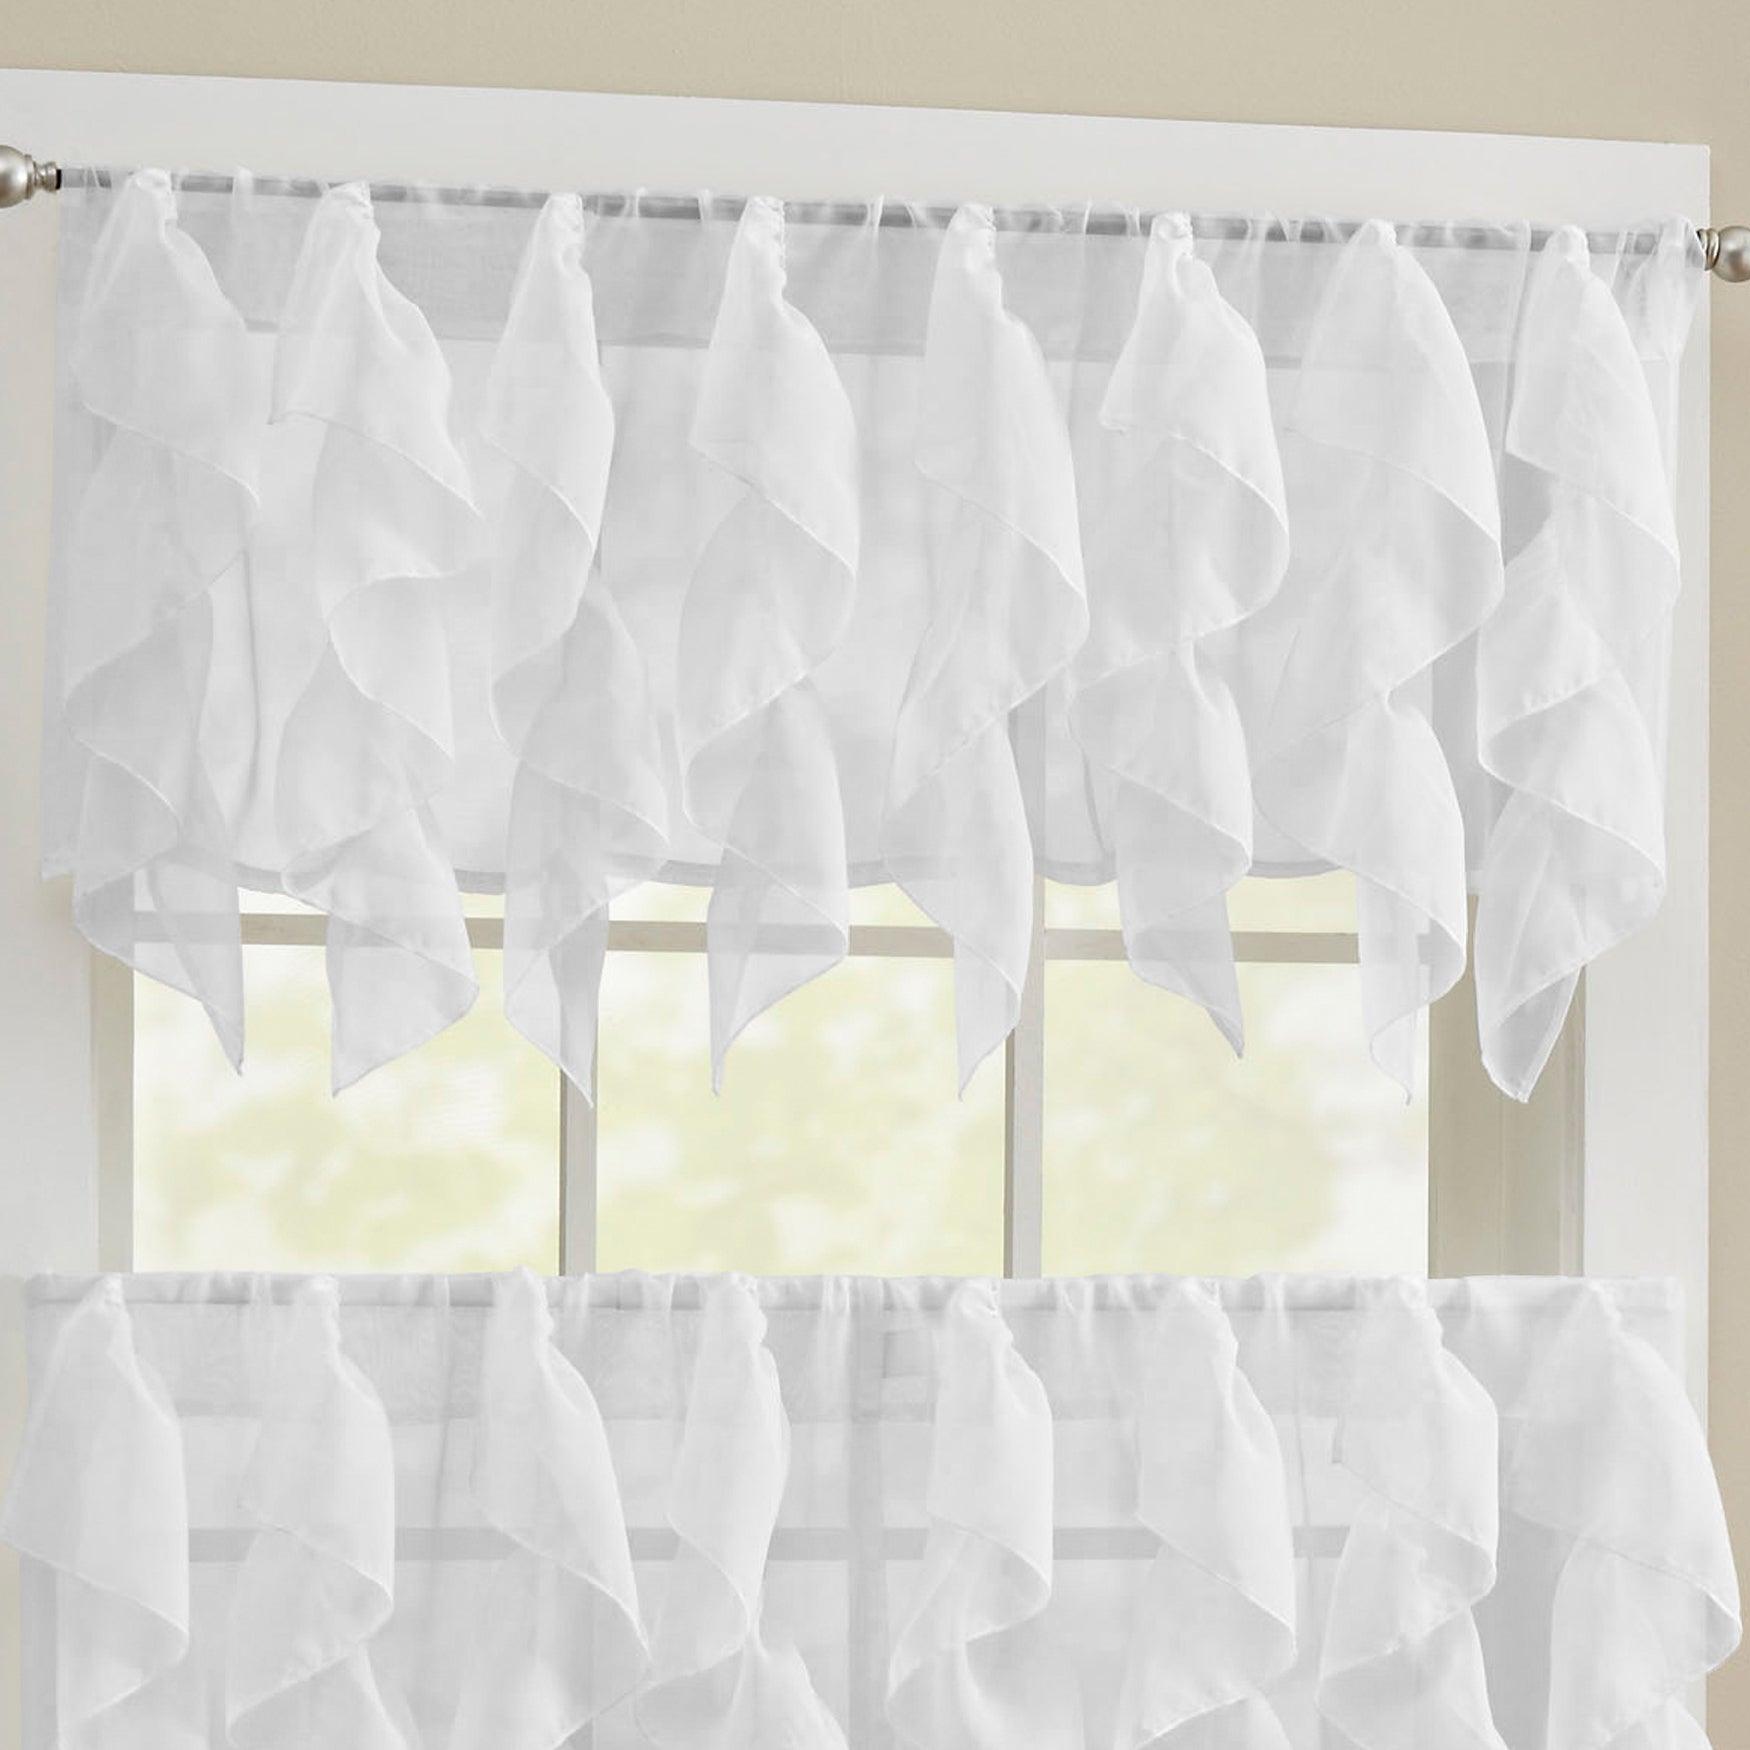 Chic Sheer Voile Vertical Ruffled Tier Window Curtain Valance And Tier In Chic Sheer Voile Vertical Ruffled Window Curtain Tiers (View 6 of 20)